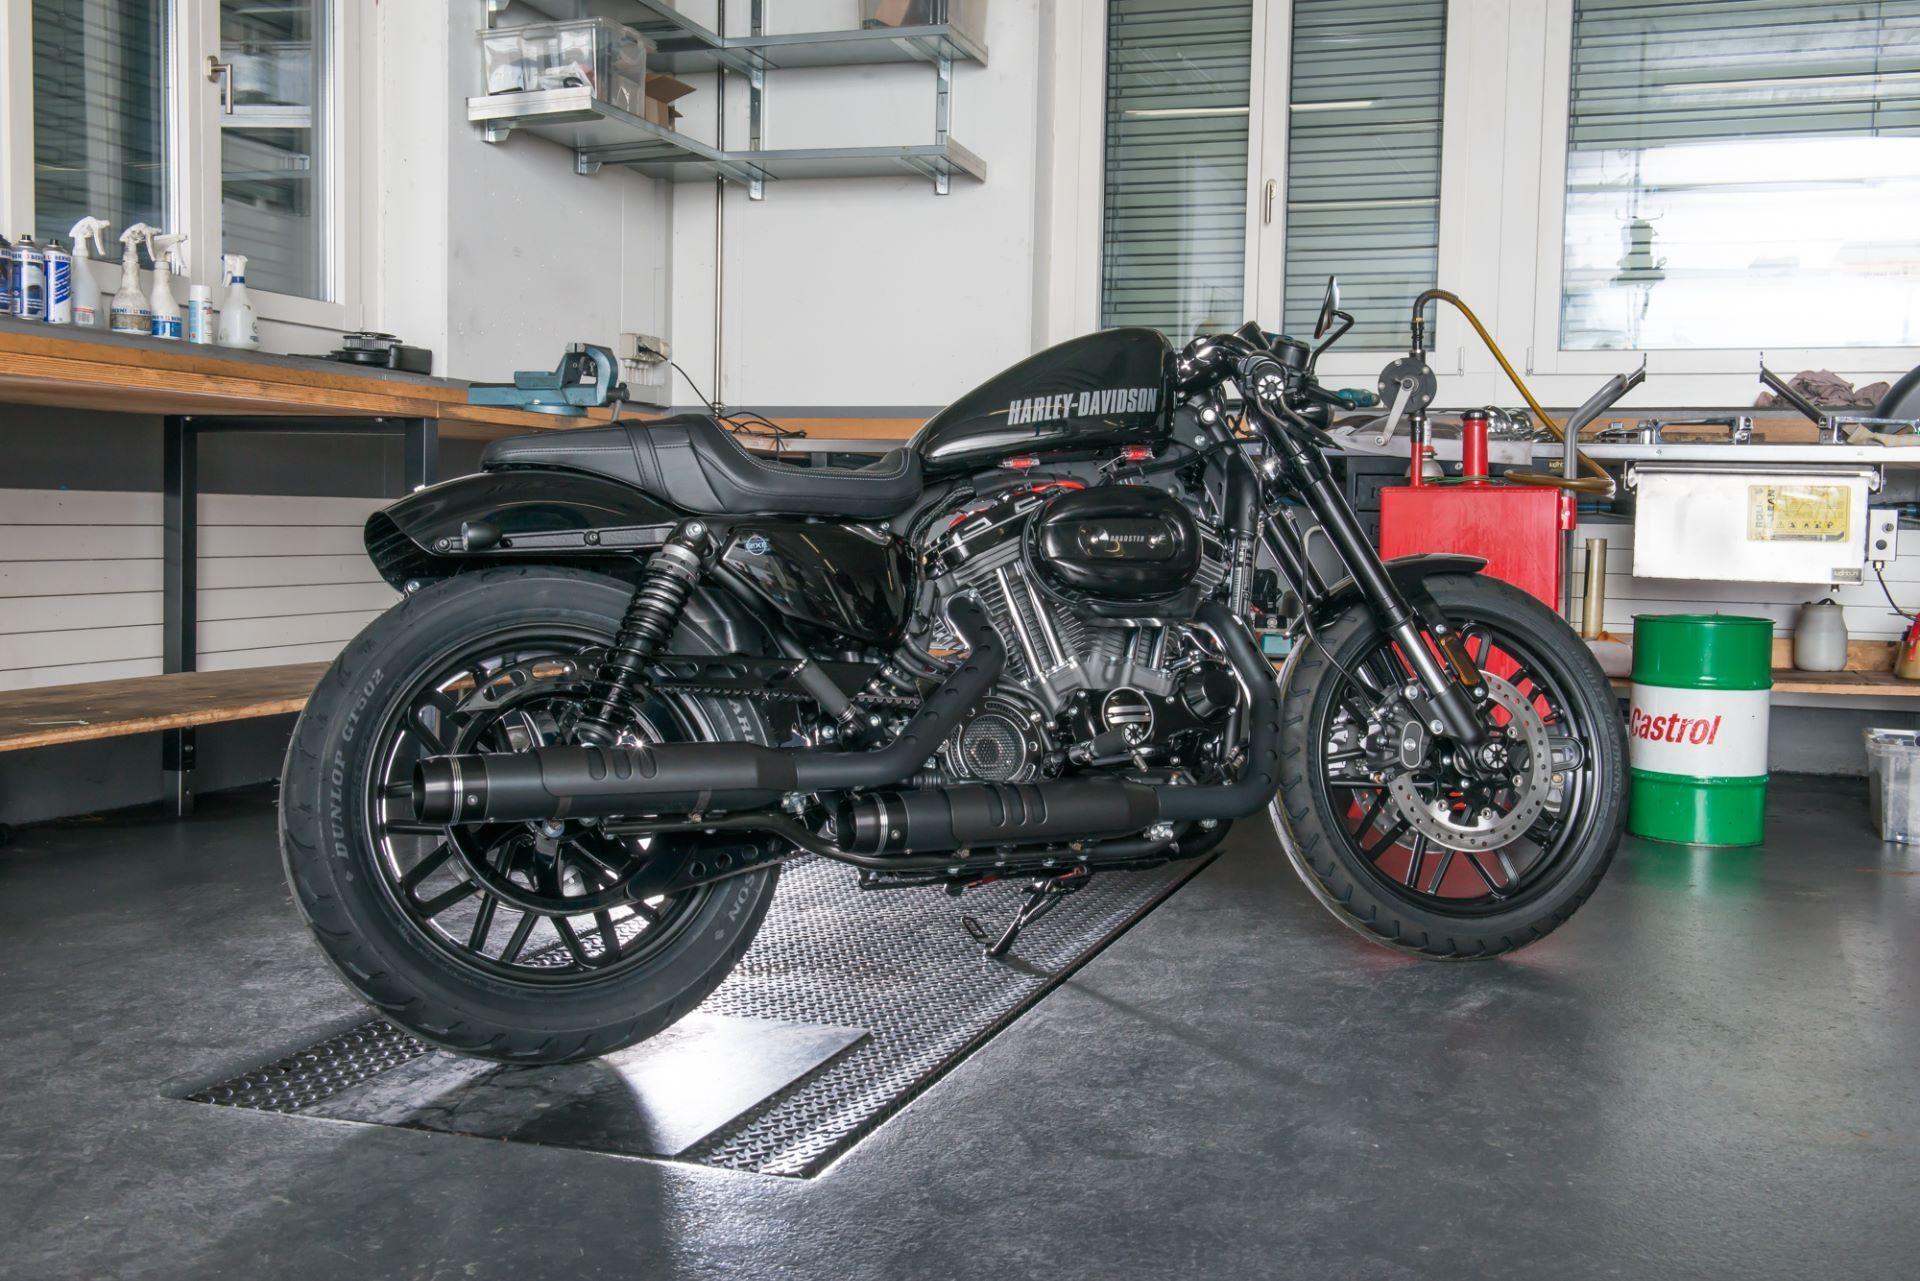 Buy Motorbike New Vehicle Bike Harley Davidson Xl 1200cx